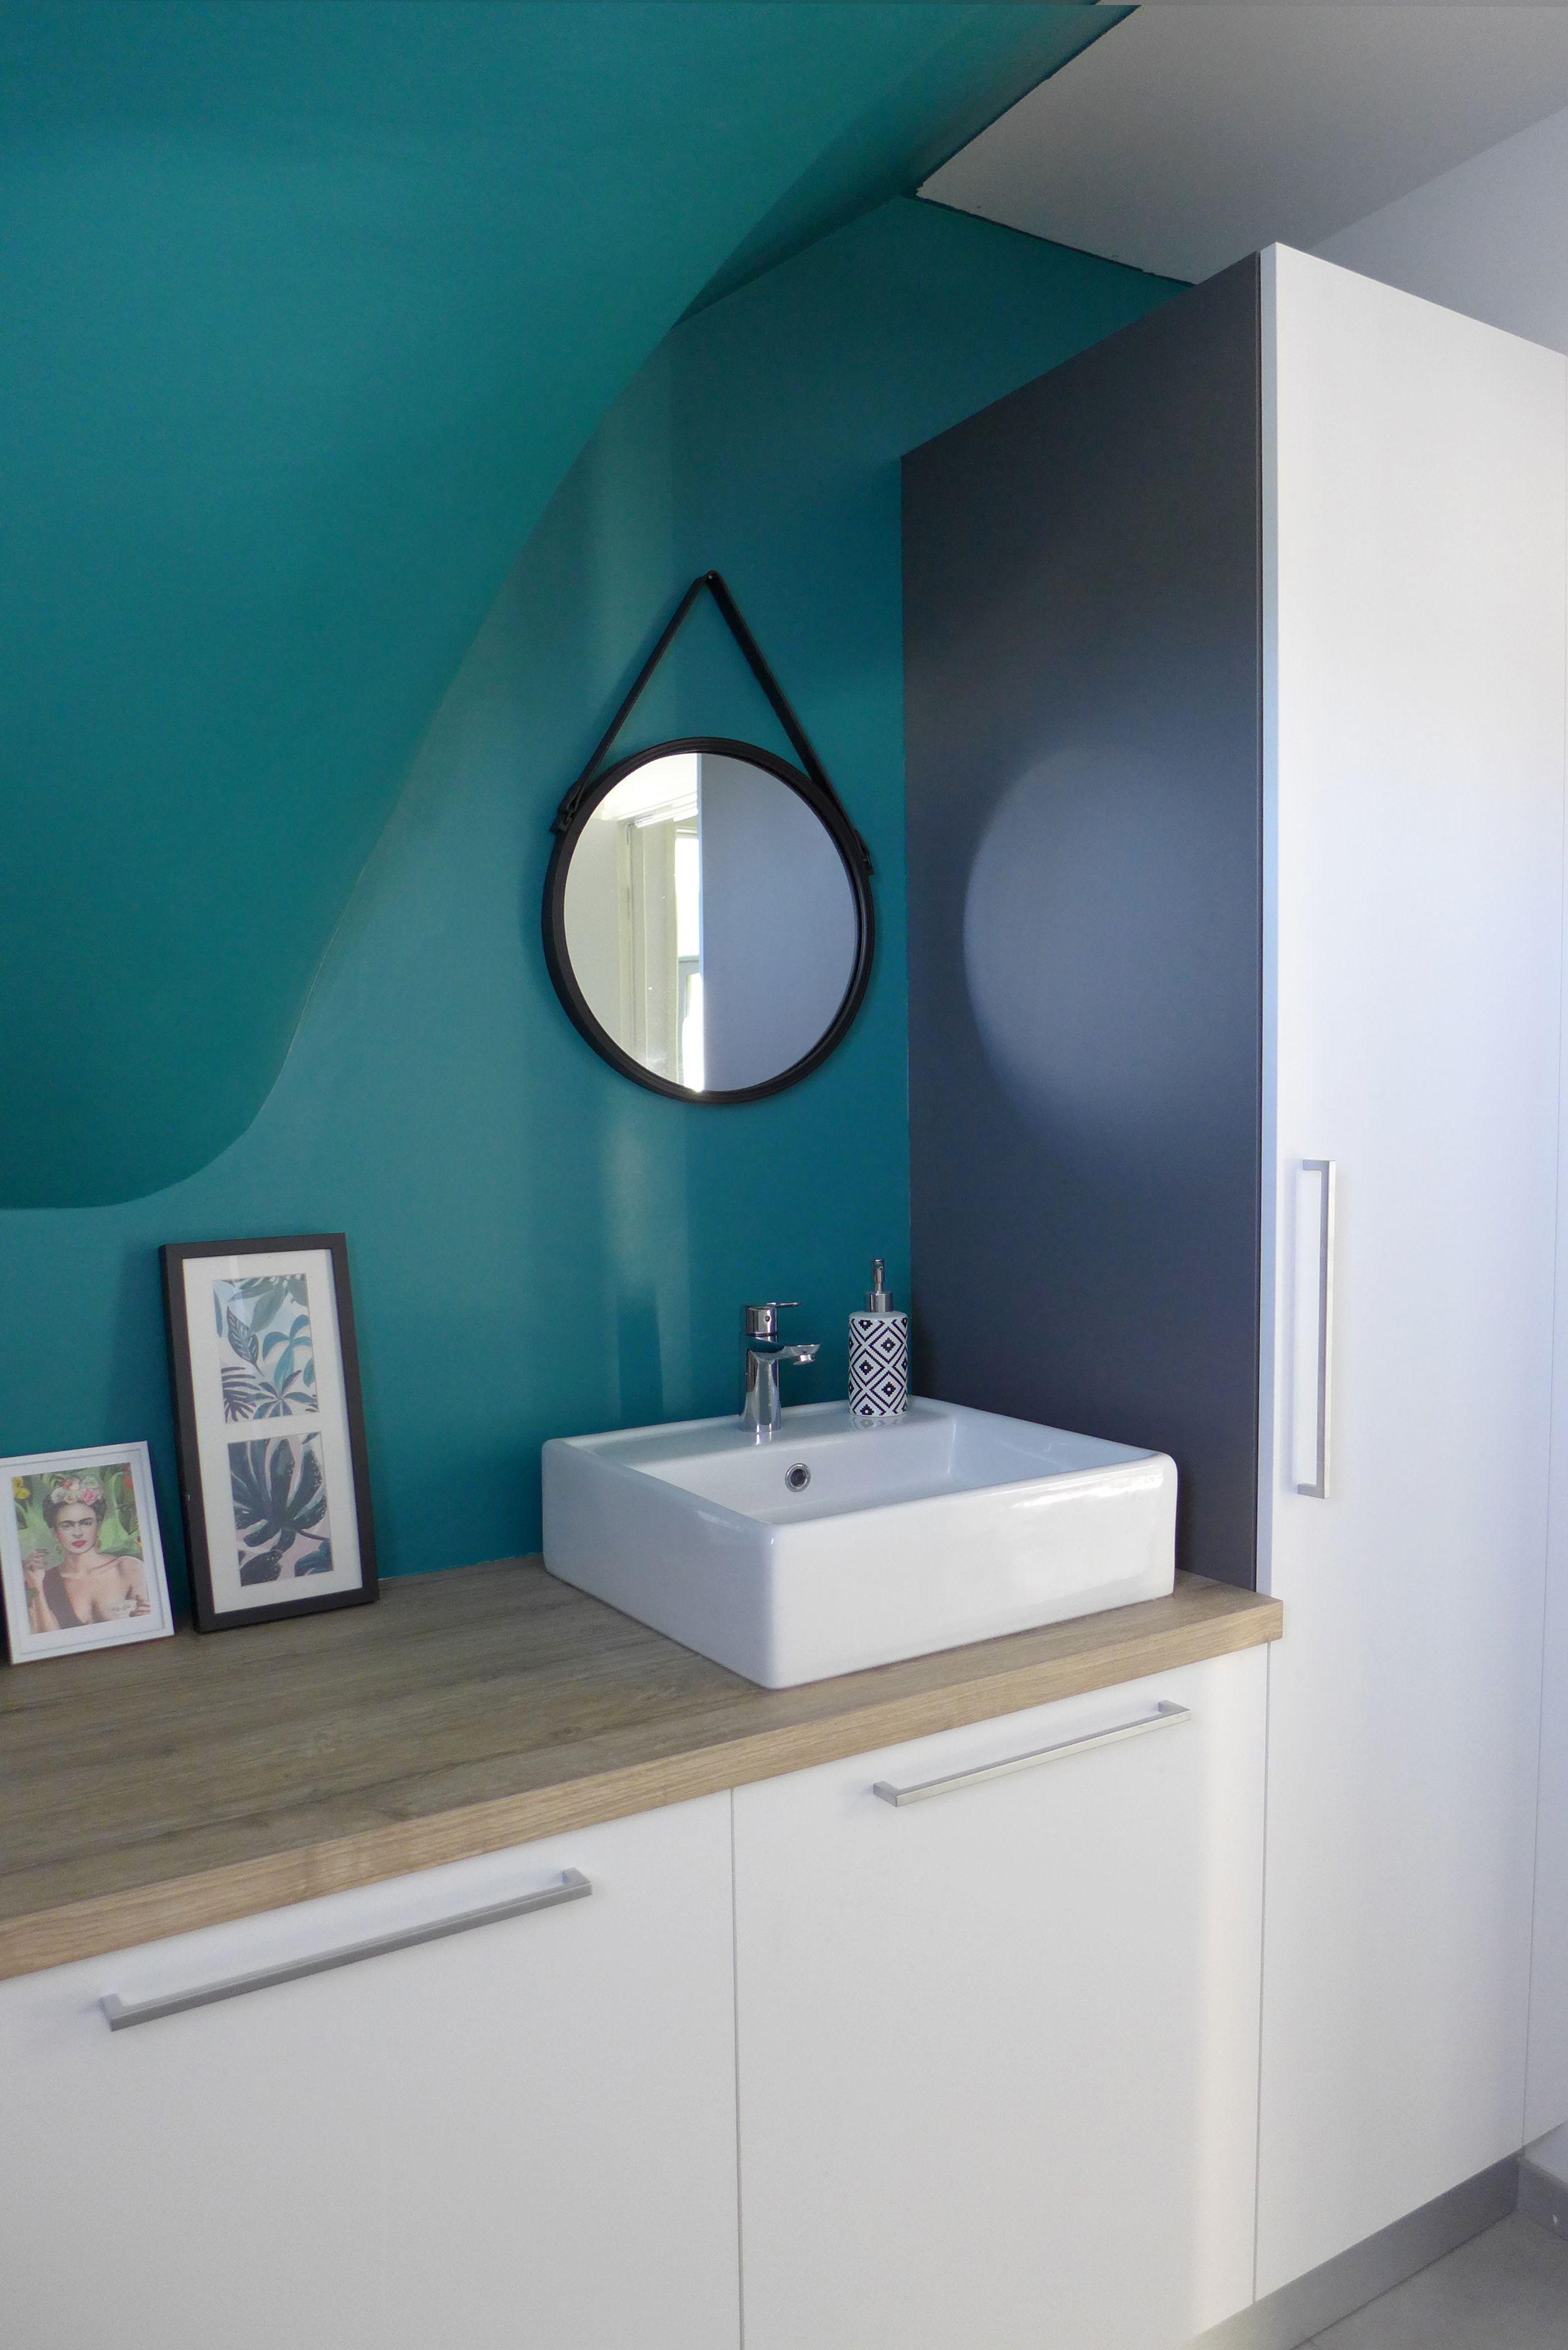 Un Grand Wc Avec Rangement Sur Mesure Et Vasque A Poser Sous L Escalier Teintes De Bleu Canard Peinture Bleu Canard Salle De Bain Verte Miroir Salle De Bain